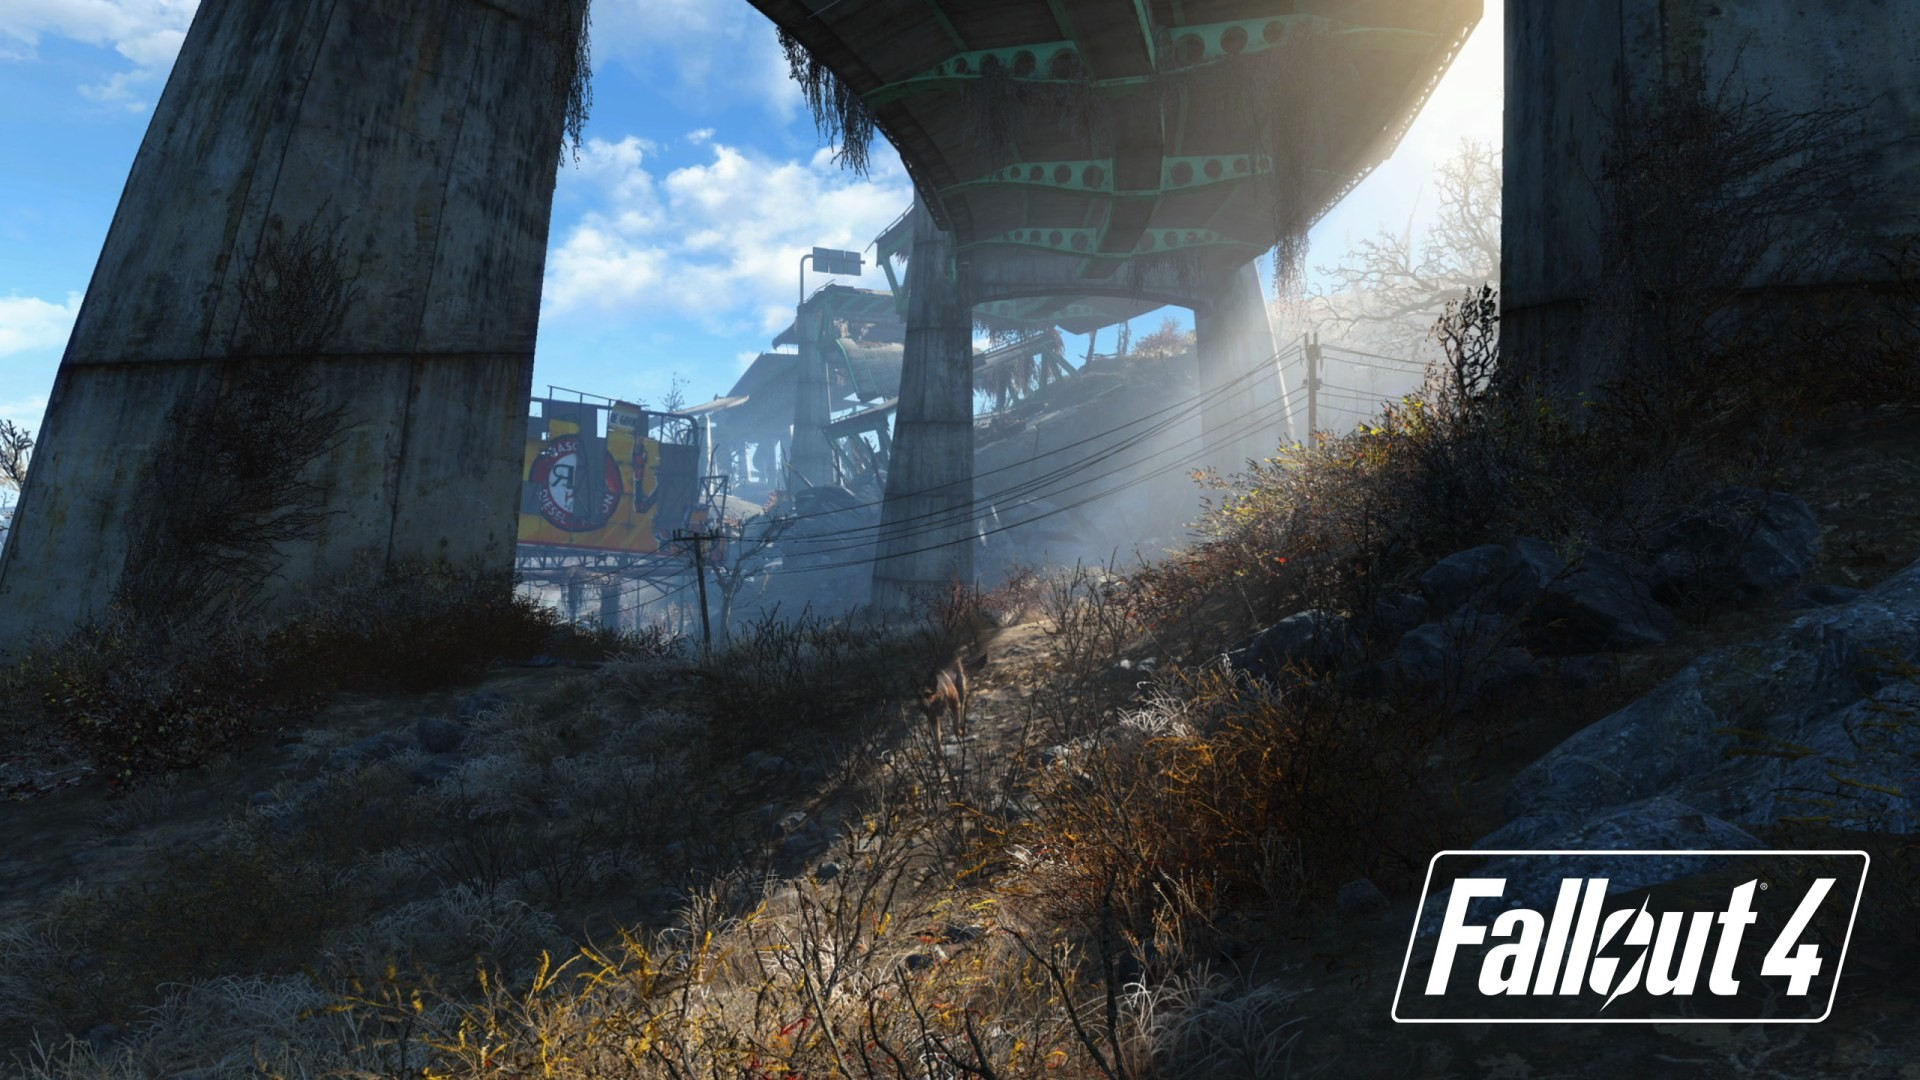 Fallout 4 Video Game Wallpaper 6716